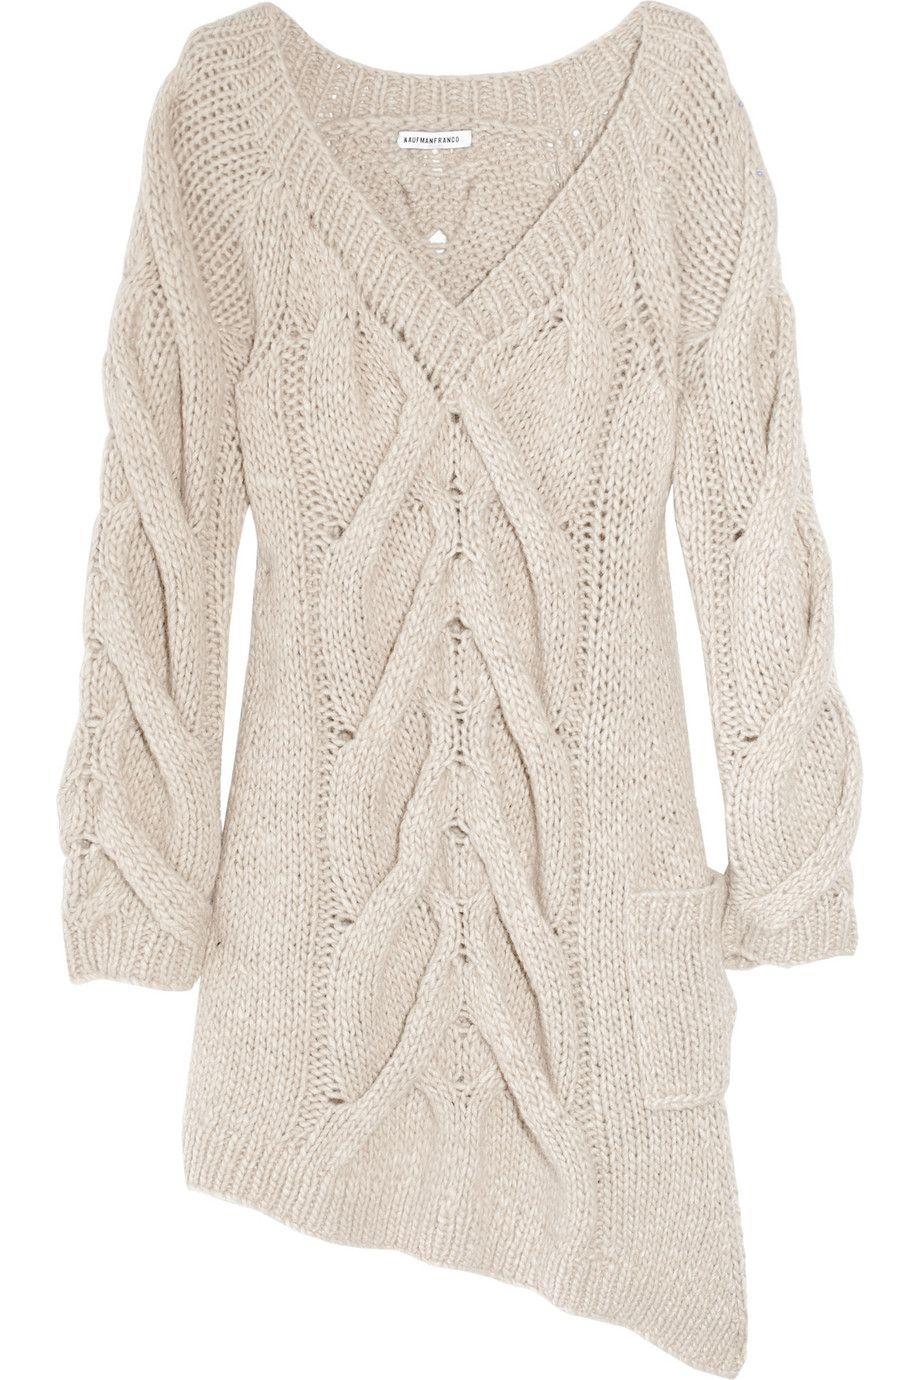 Kaufmanfranco sweater dress